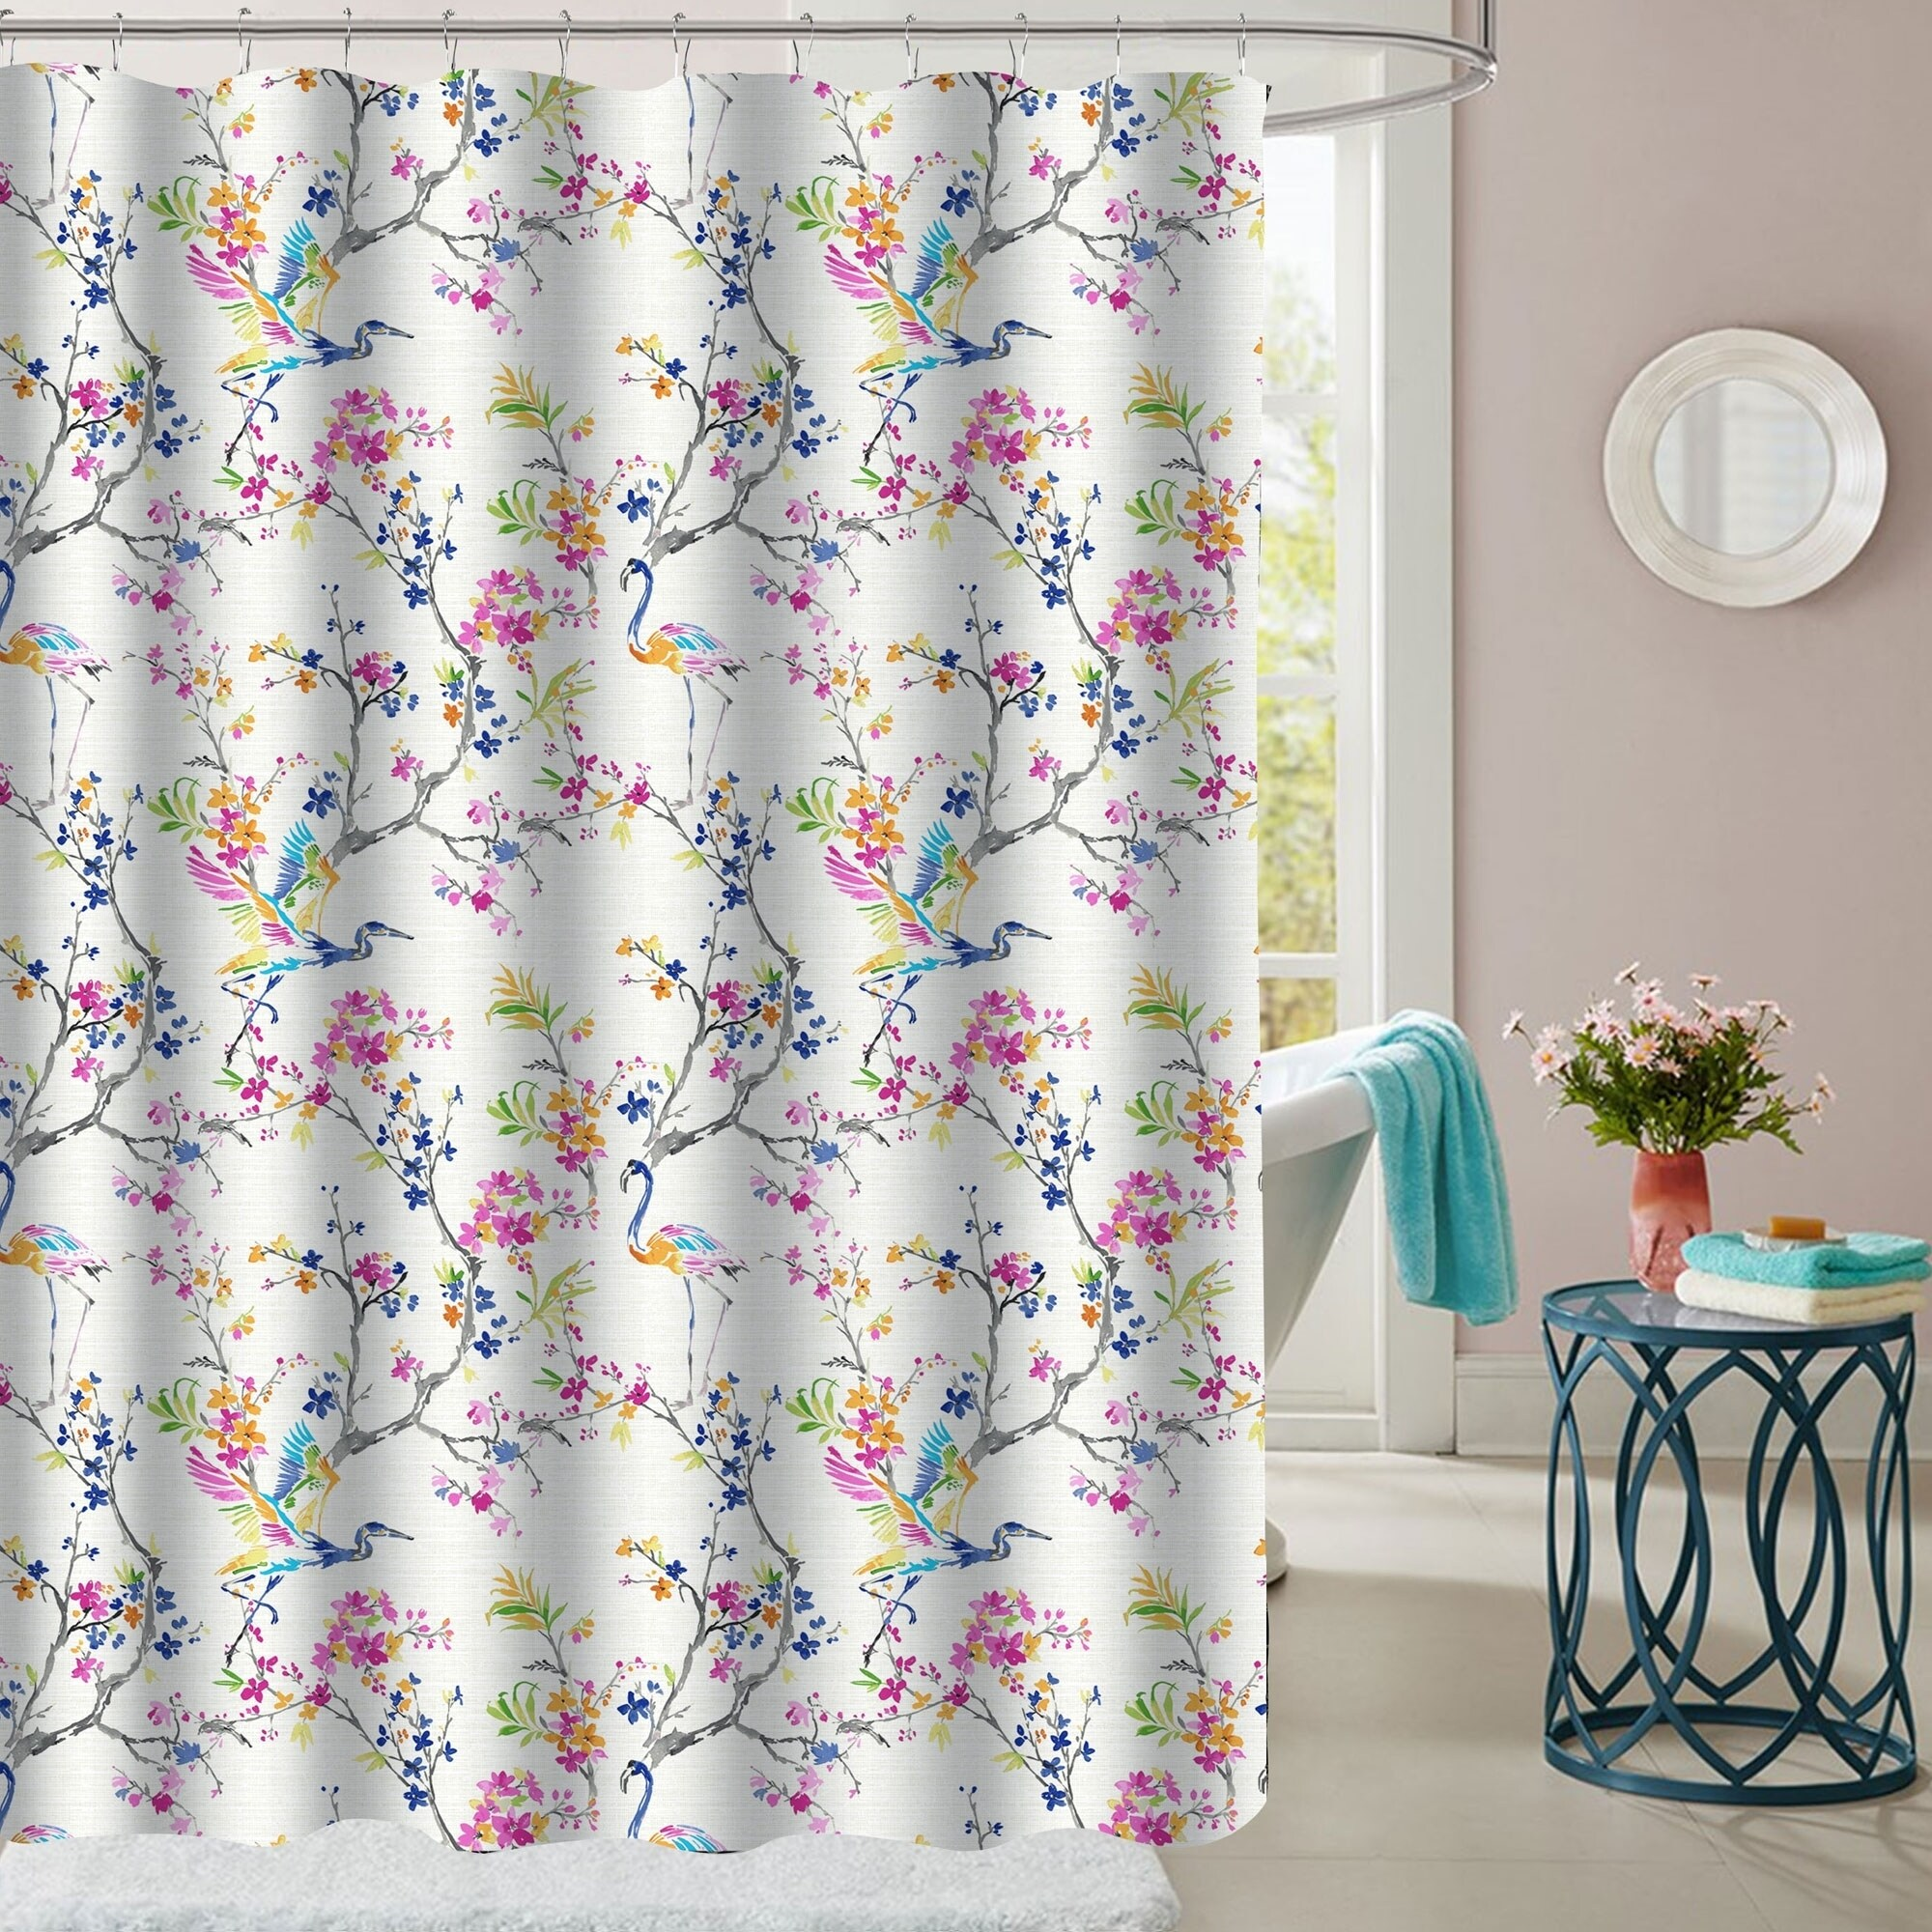 Shop Botanical Patterned Fabric Shower Curtain 70x72